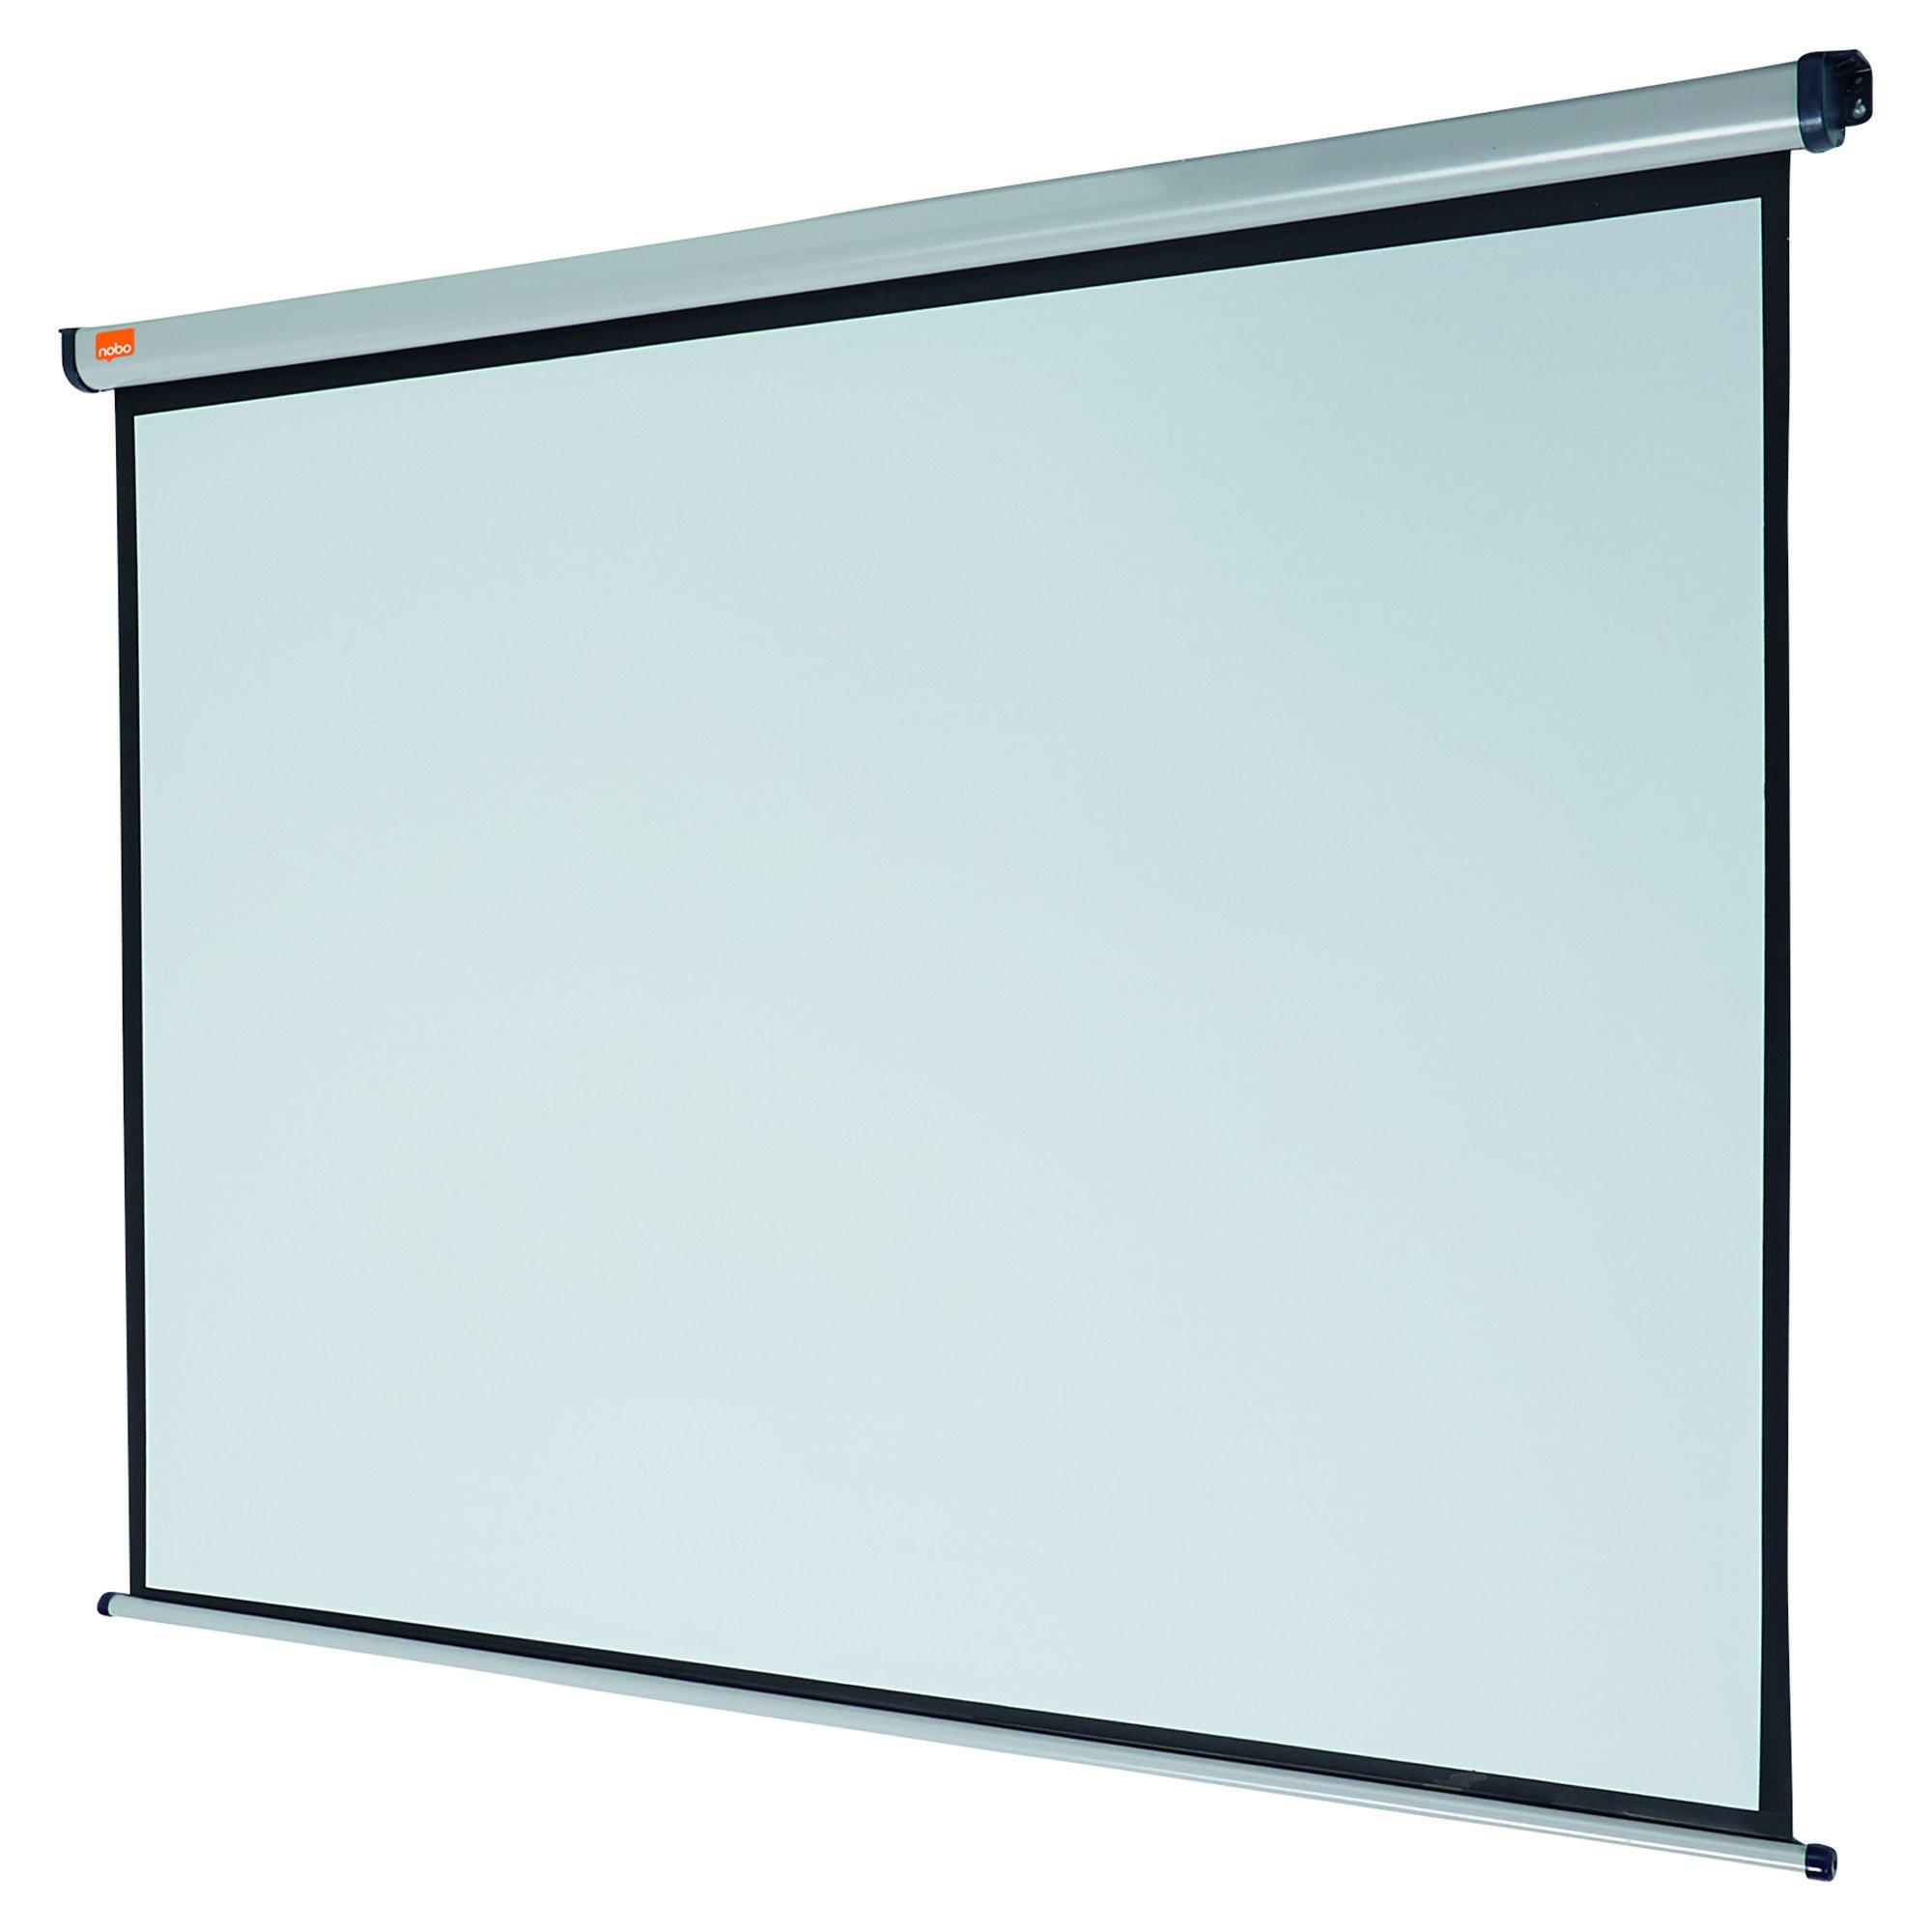 Nobo Wall Screen 2000 X 1350 1902393W